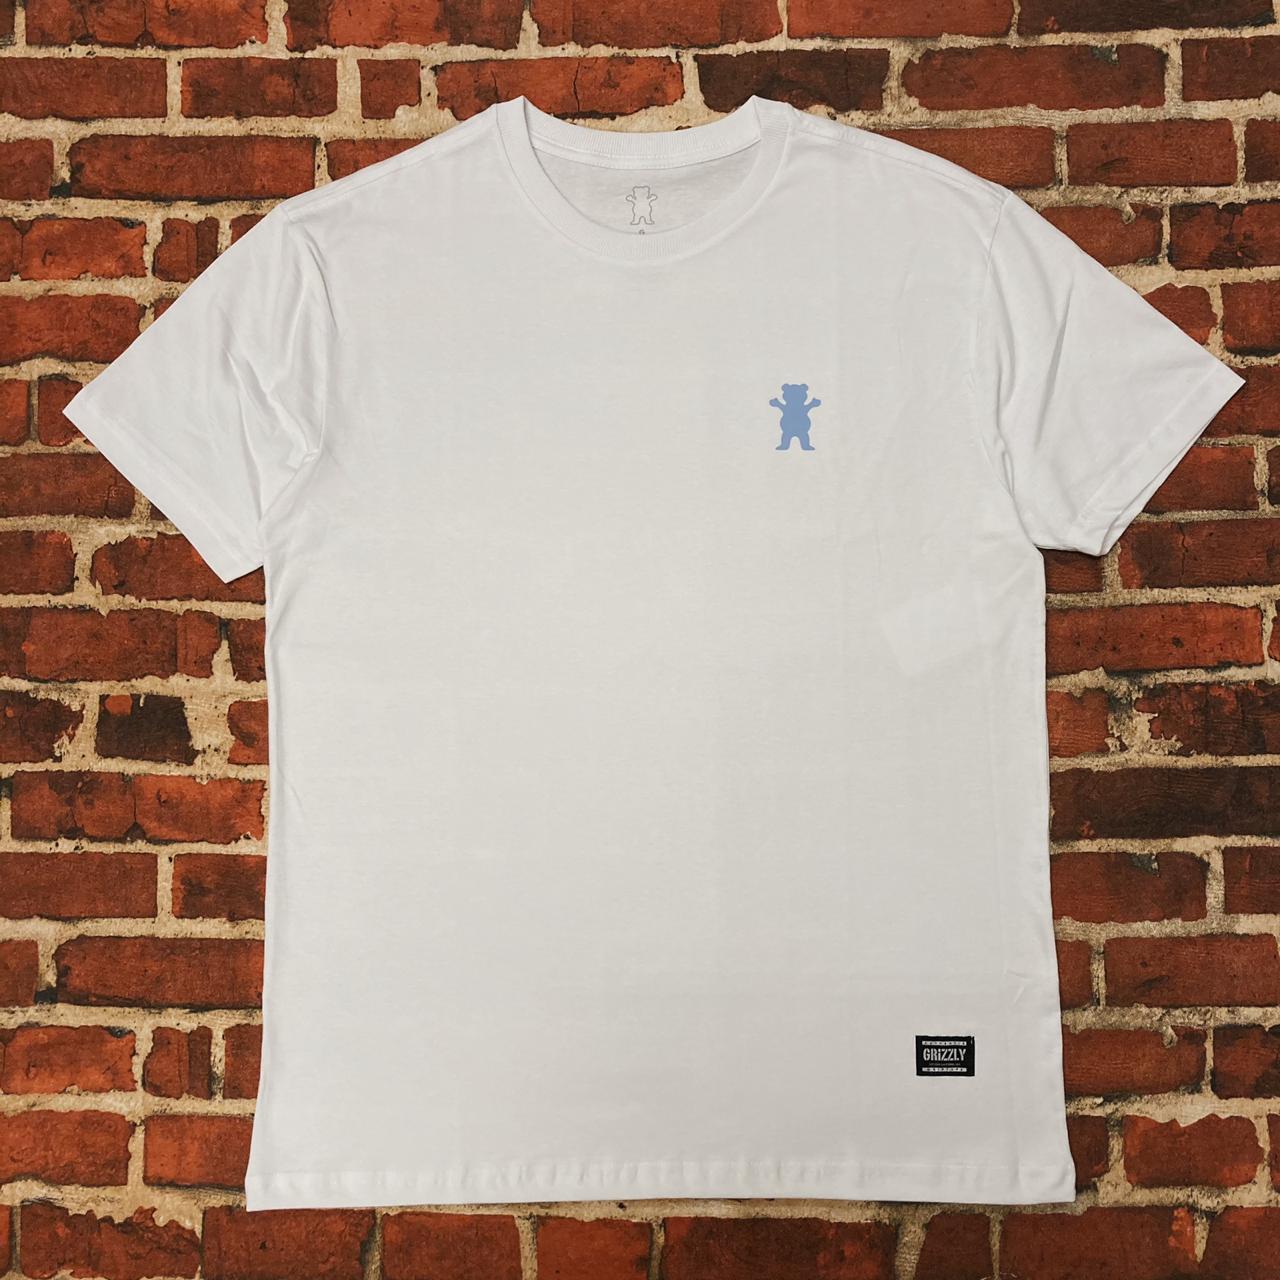 Camiseta grizzly mini logo og bear white